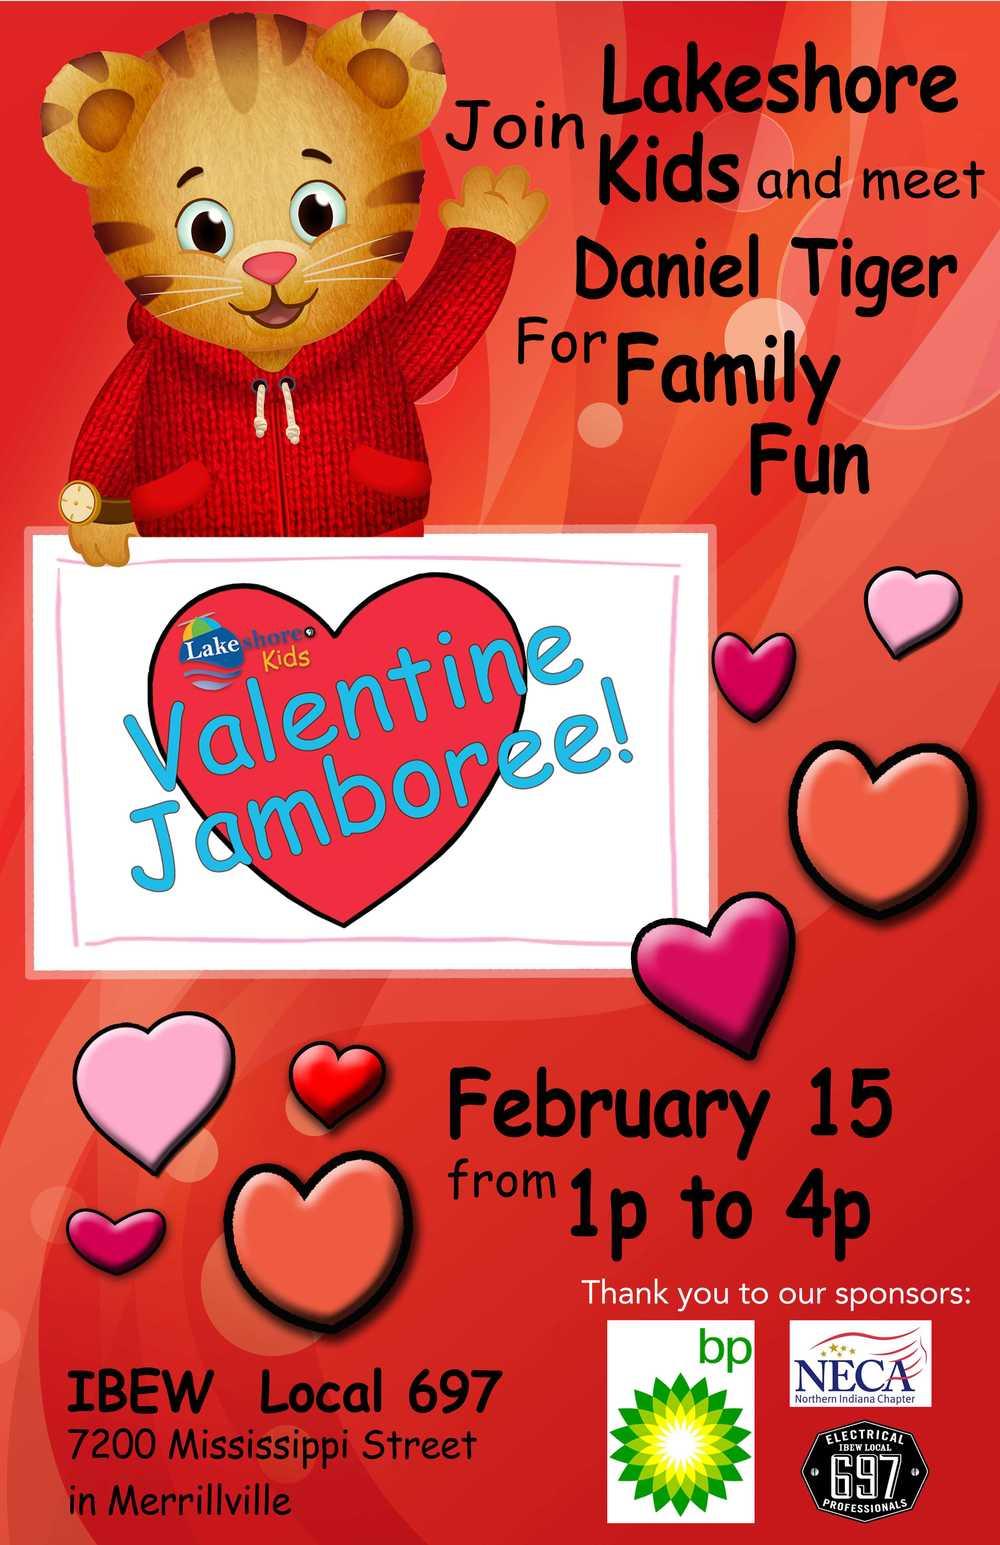 Valentines Day Jamoree.jpg